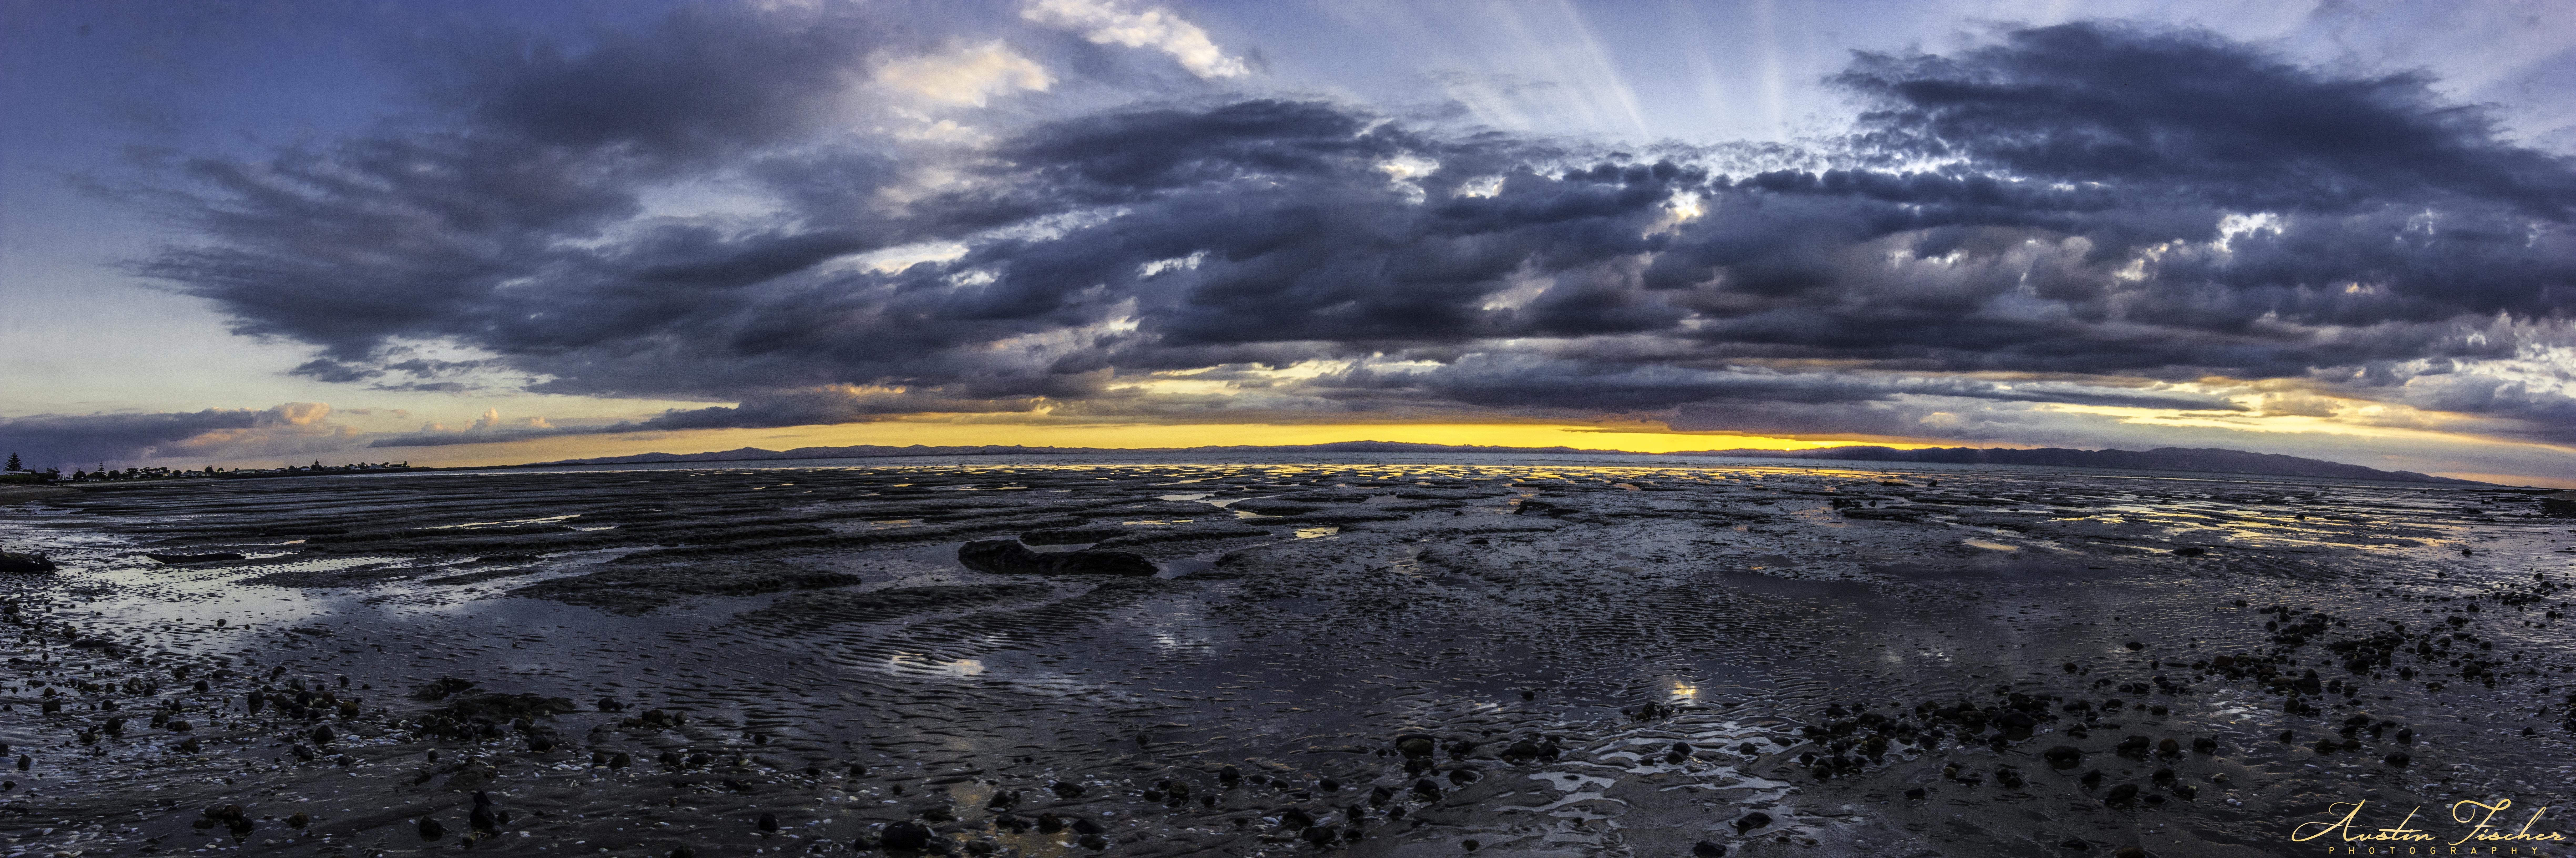 Coromandel Sunset 2